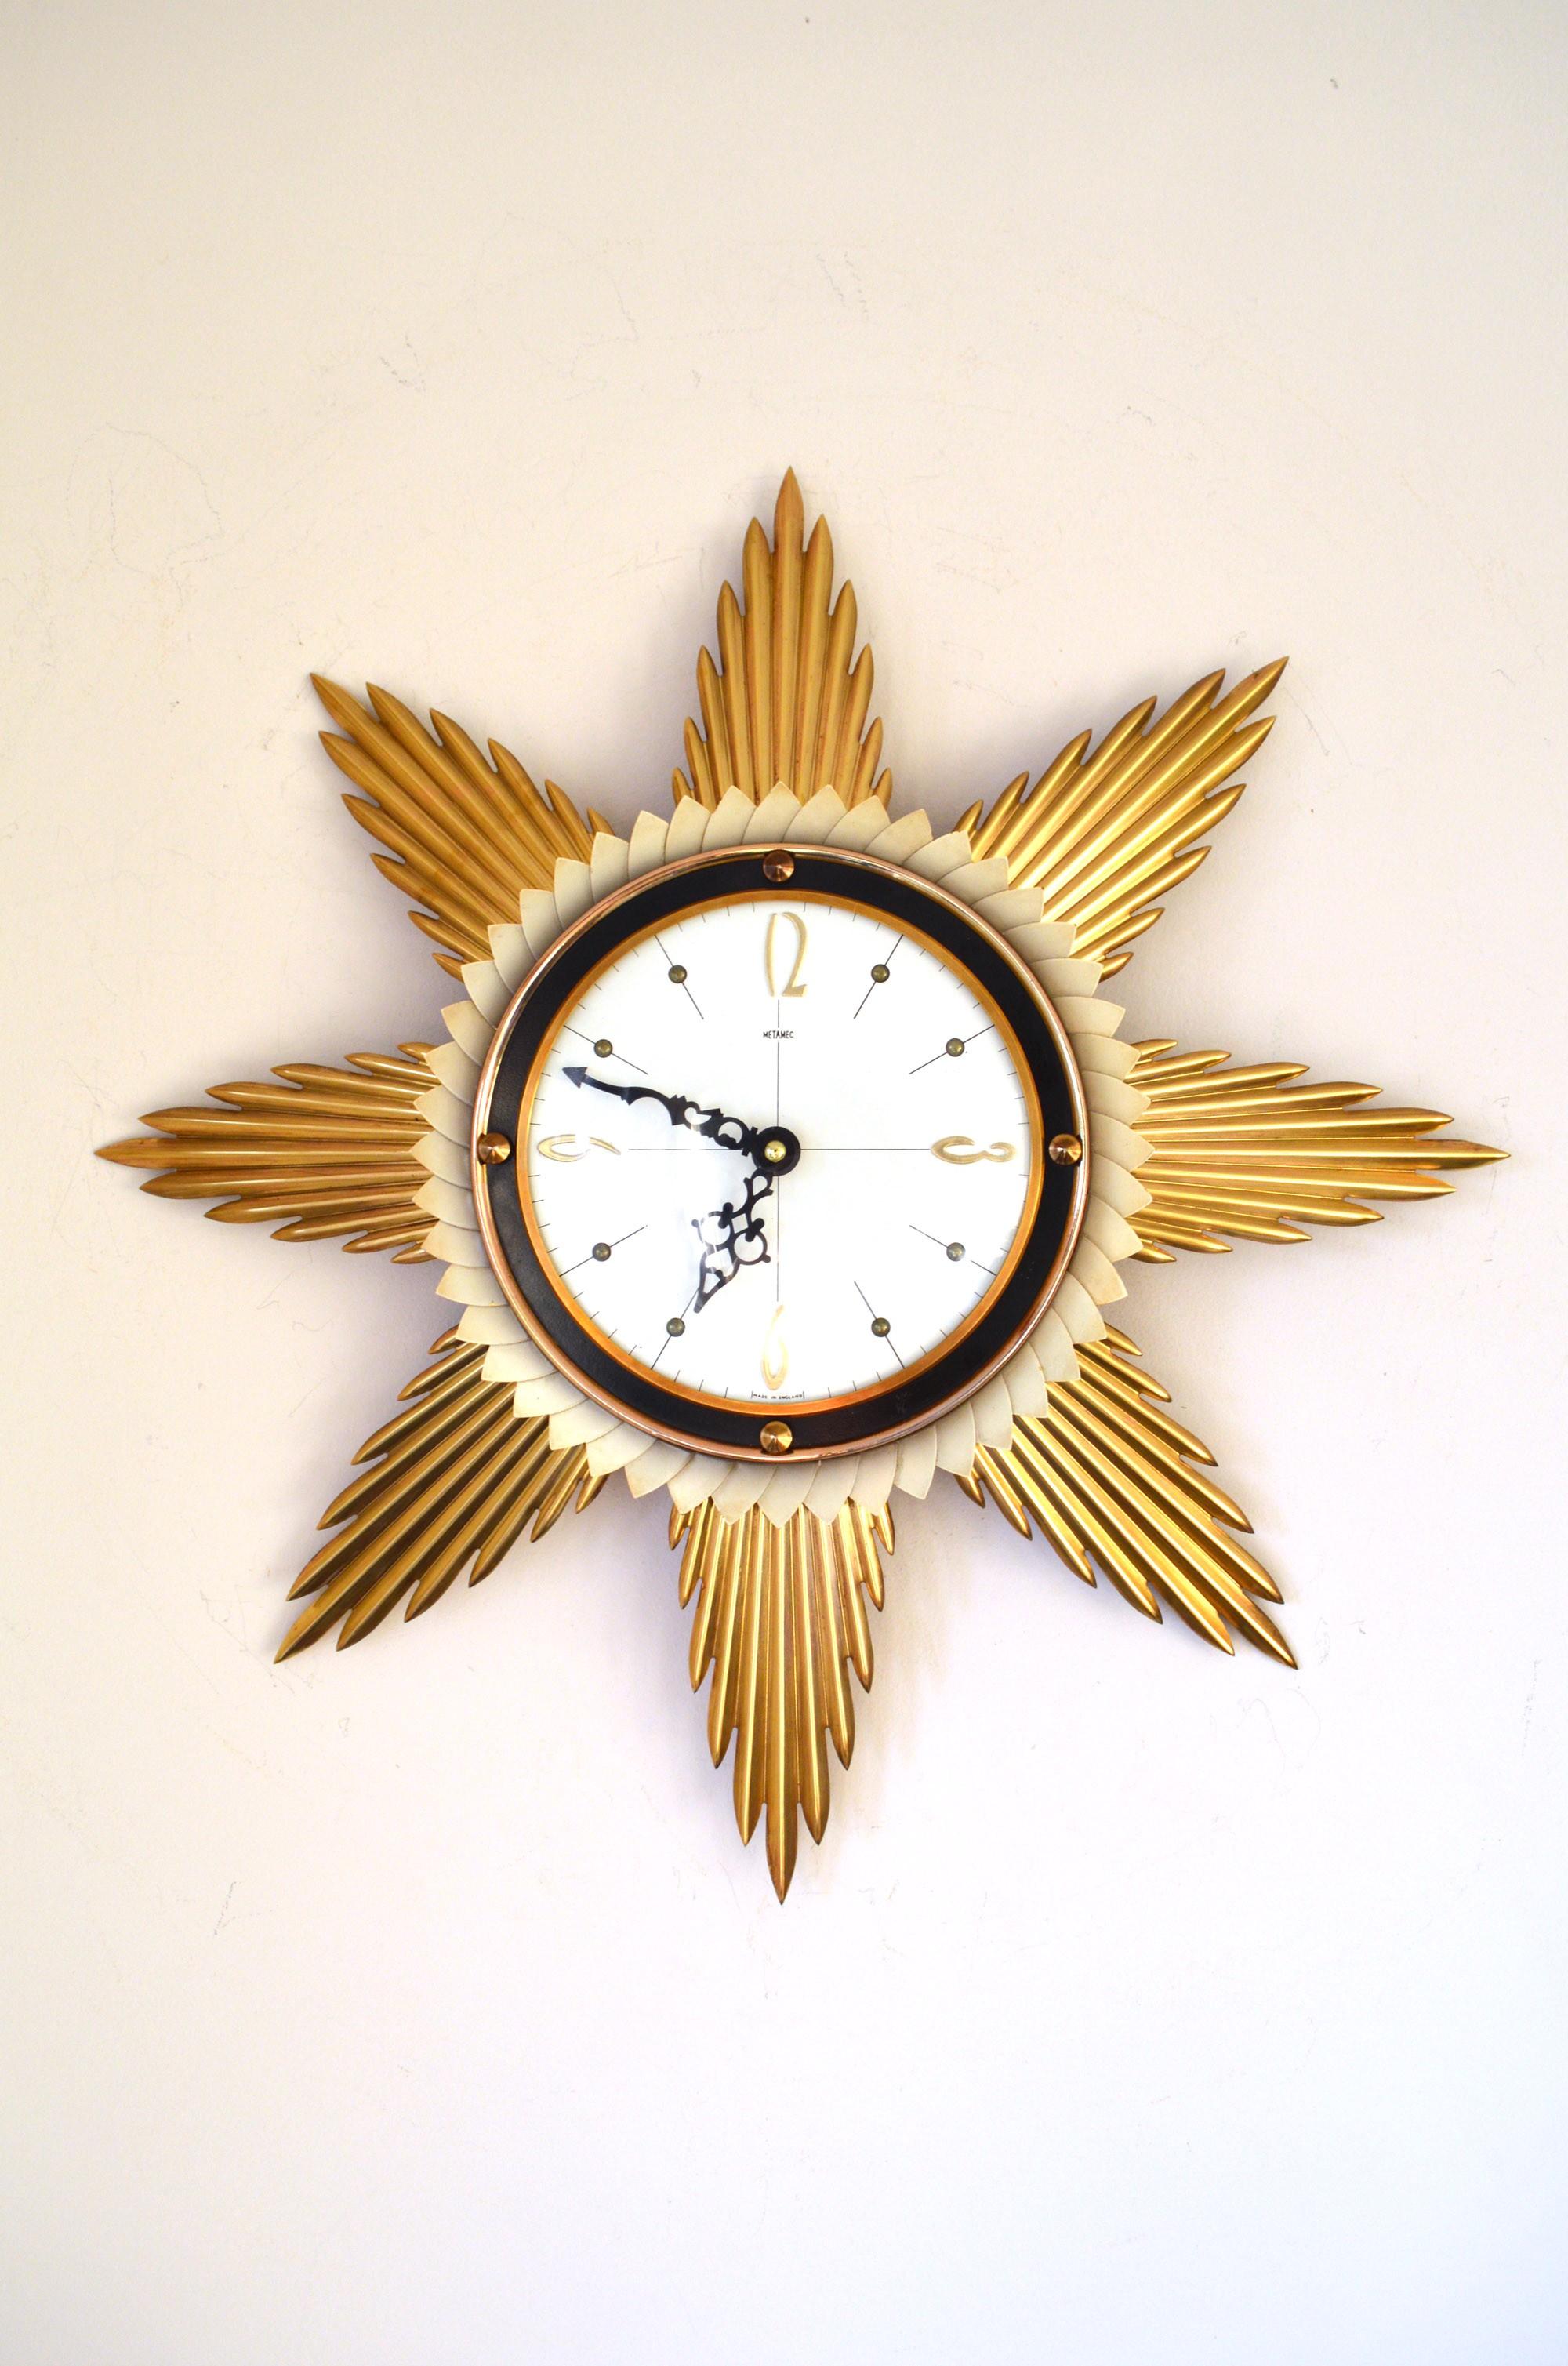 Vintage Clocks retro style00018.jpg